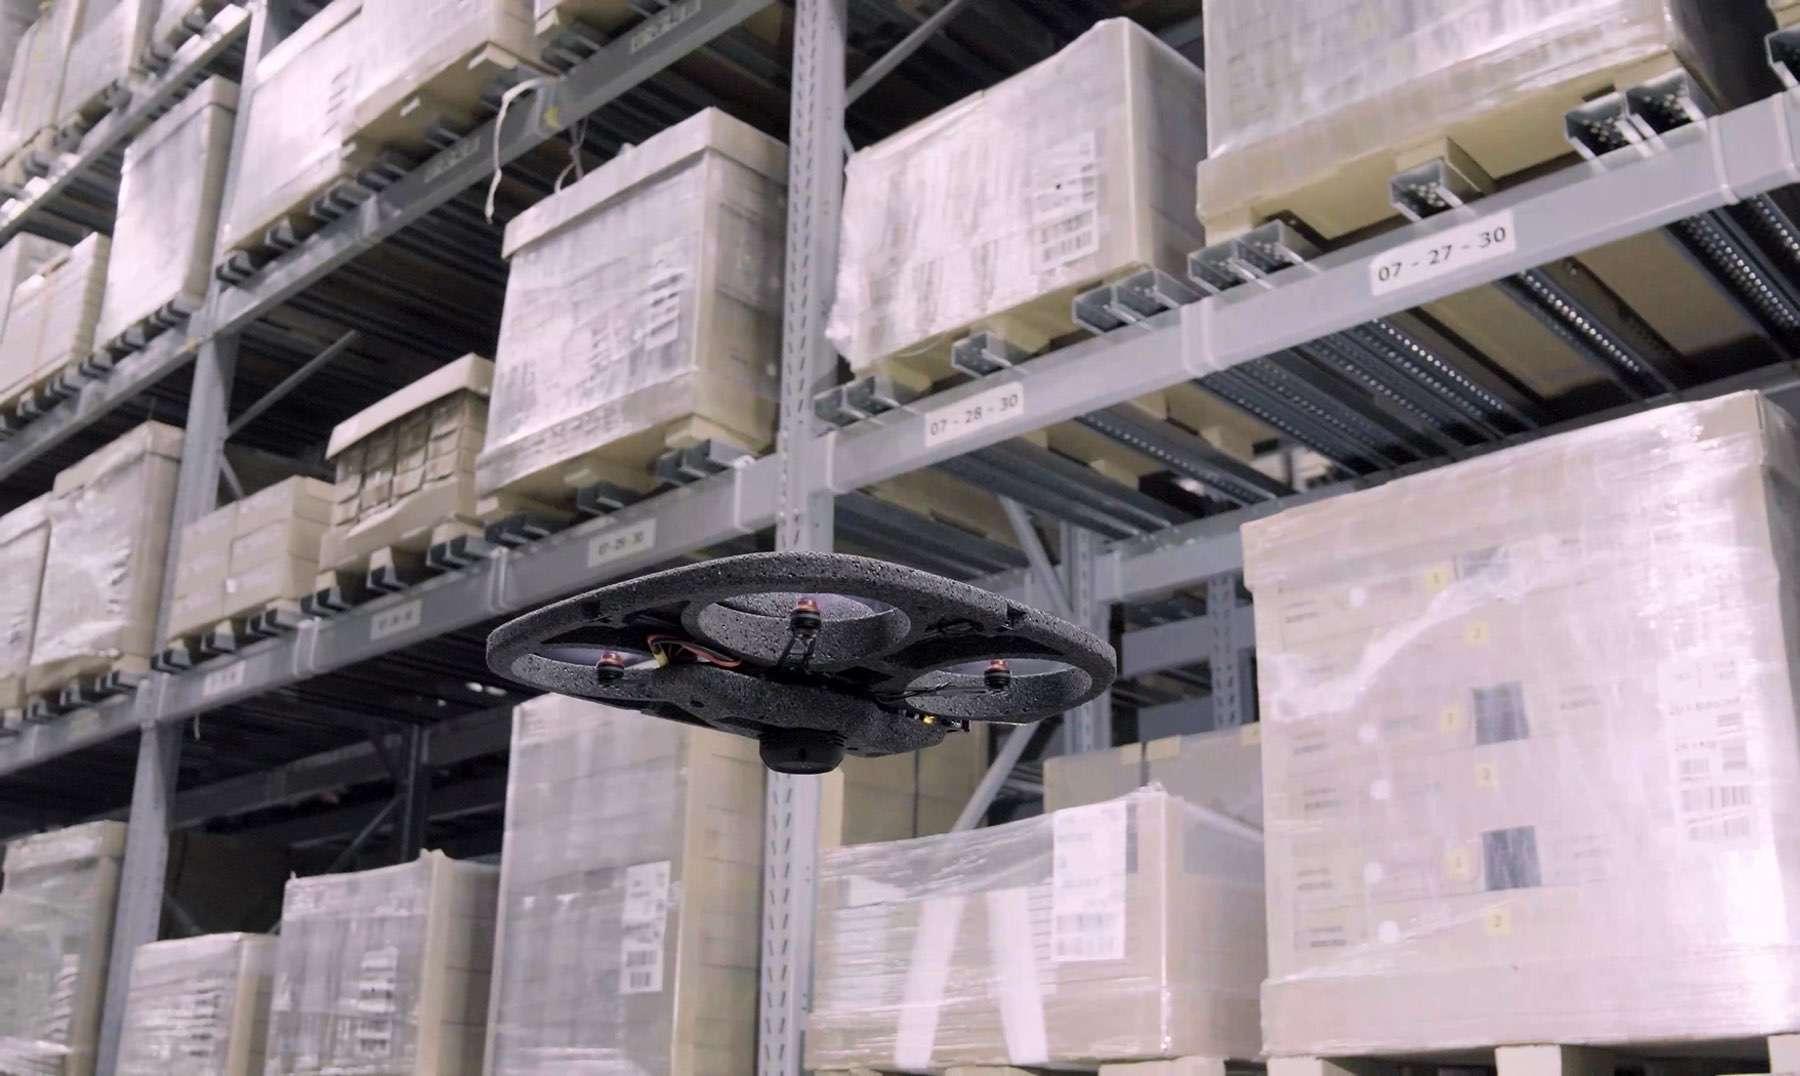 Drohnen im IKEA Spreitenbach